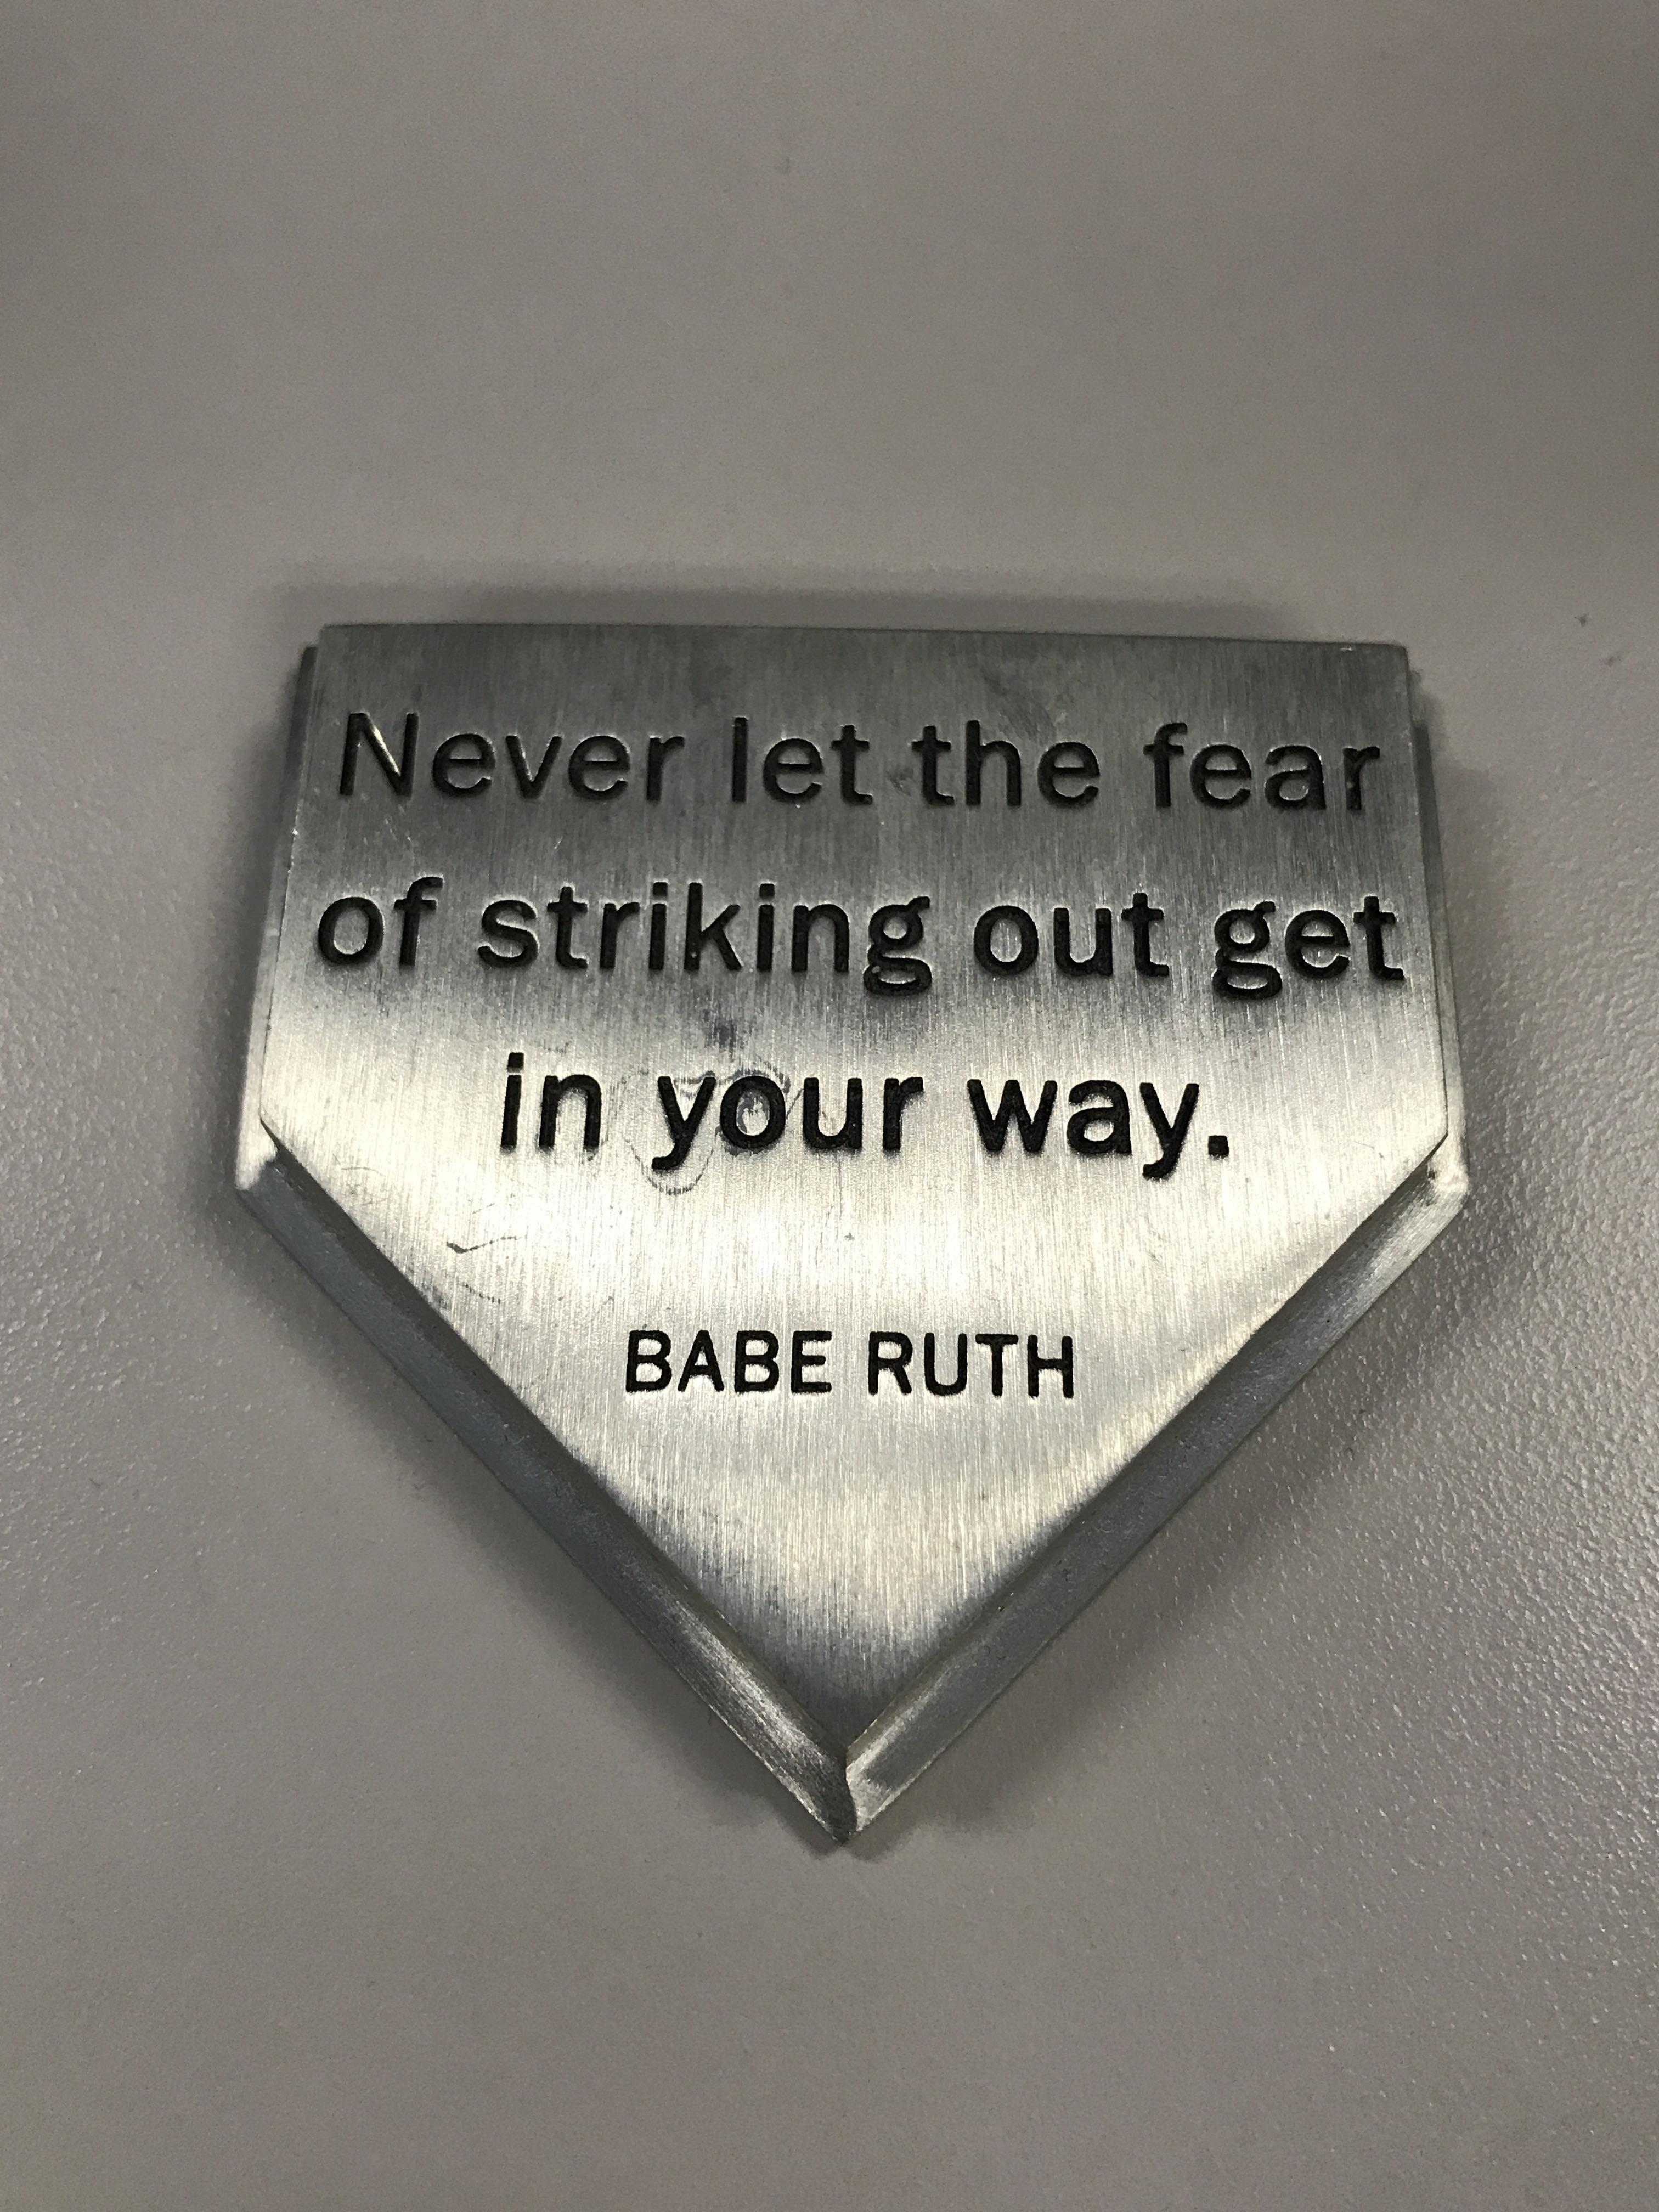 [Image] Keep swingin inspirationalquotes quotes quote